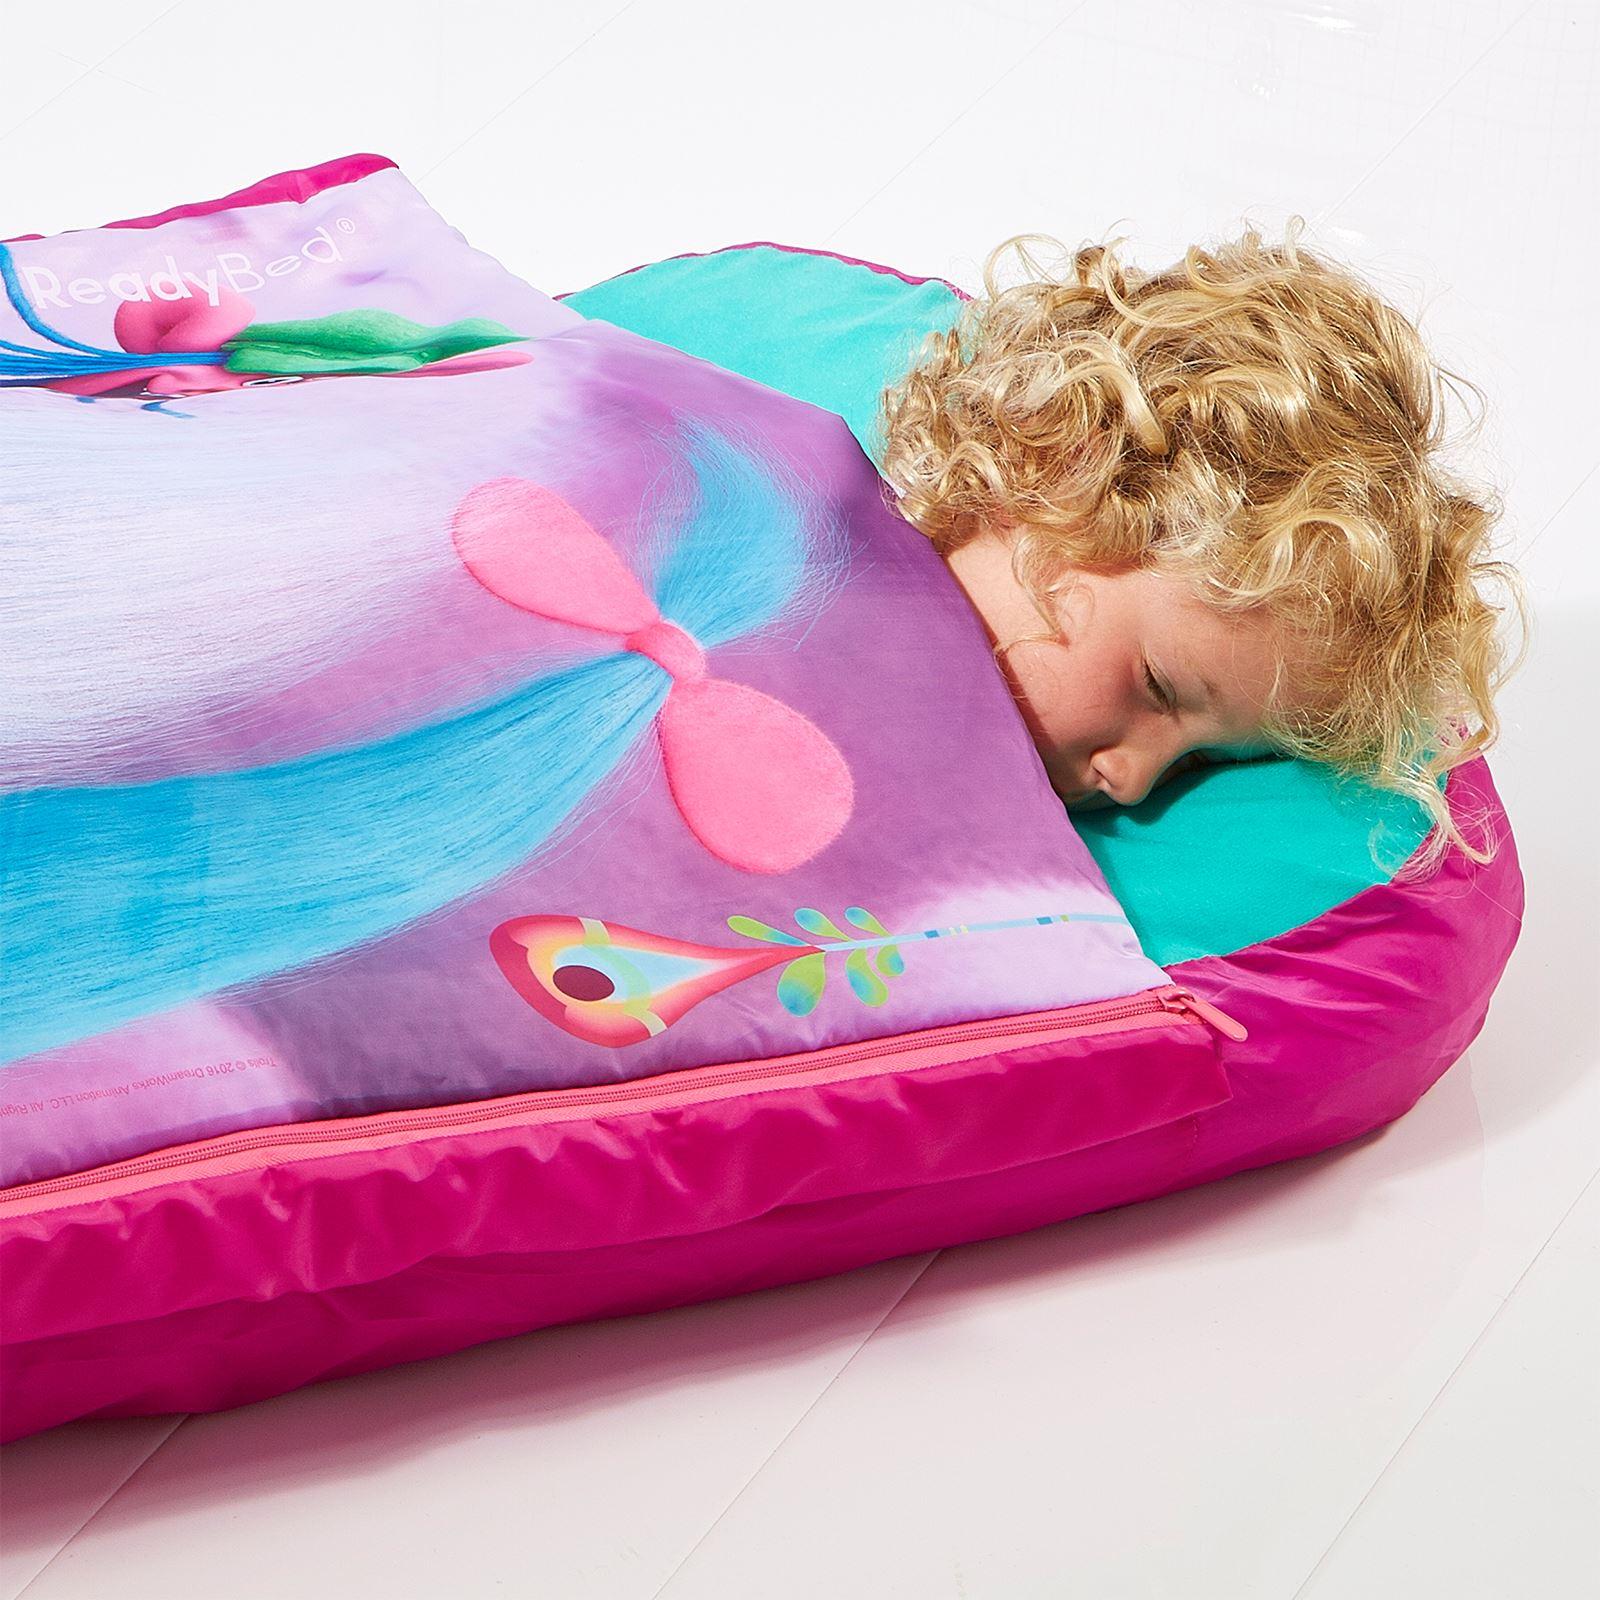 TROLLS JUNIOR READY BED SLEEPOVER SOLUTION CHILDRENS SLEEPING BAG NEW ...